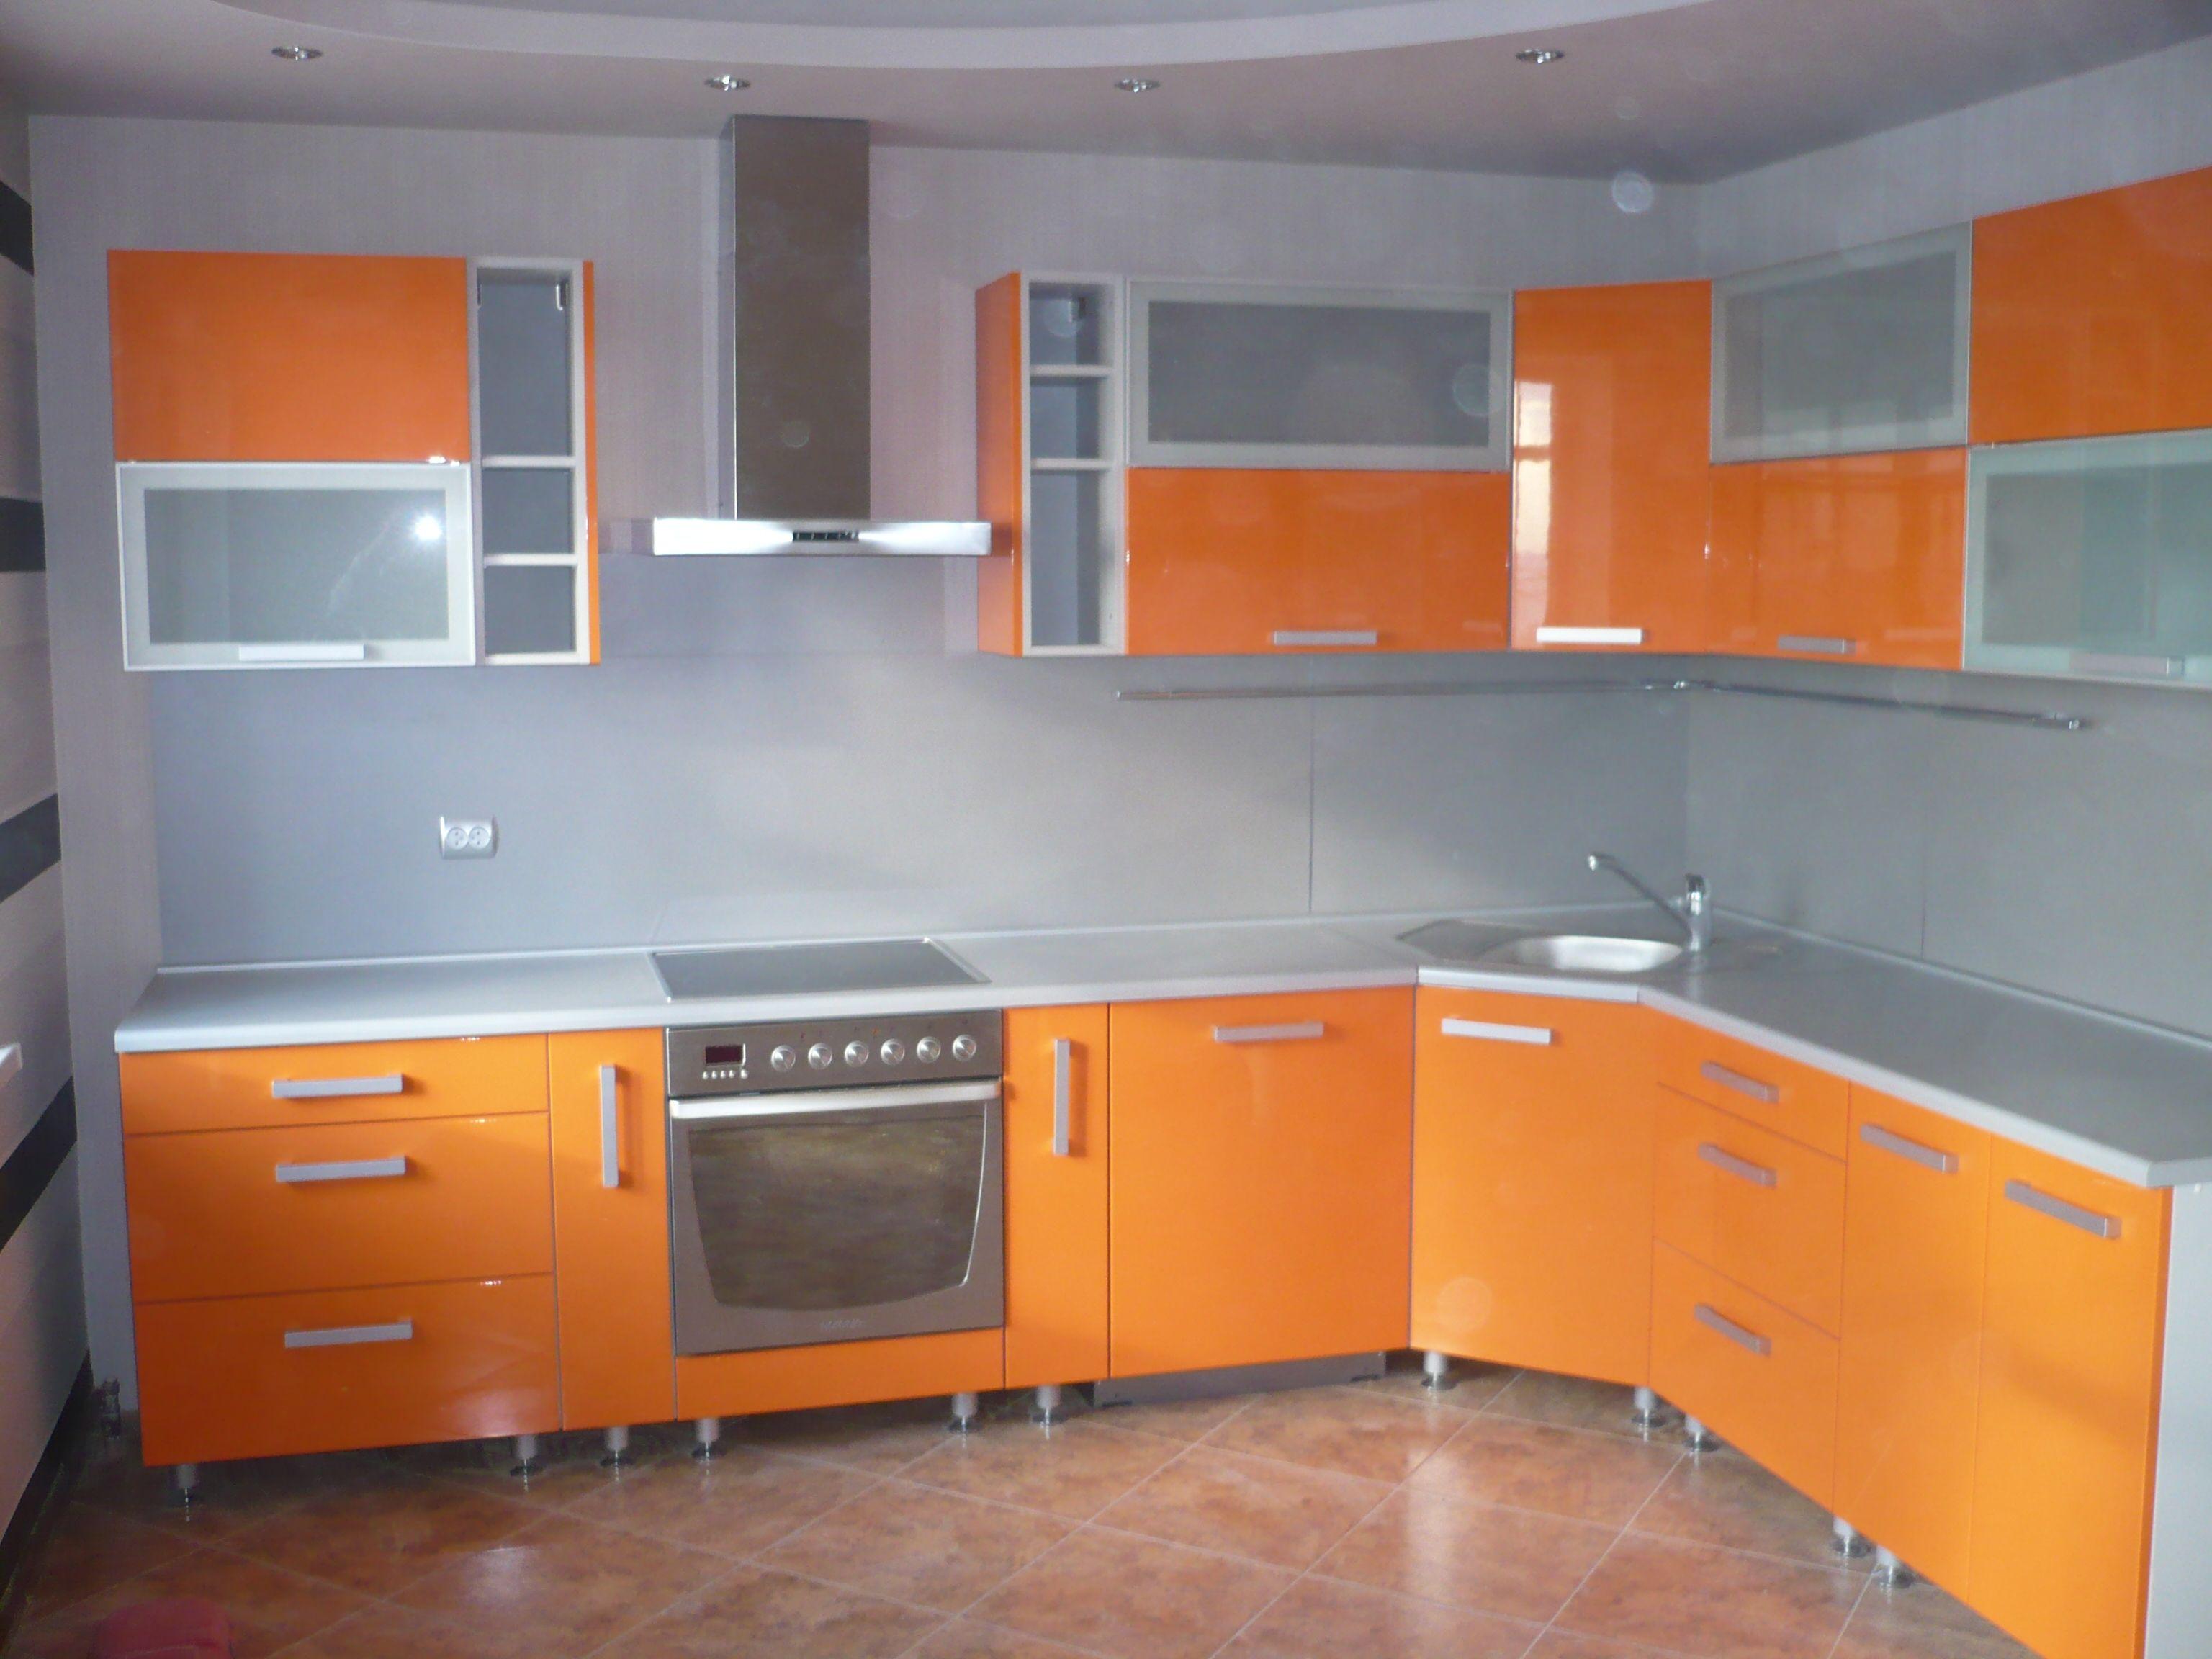 Dise o de cocinas cocinas naranjas madrid cocinas for Diseno de cocinas integrales